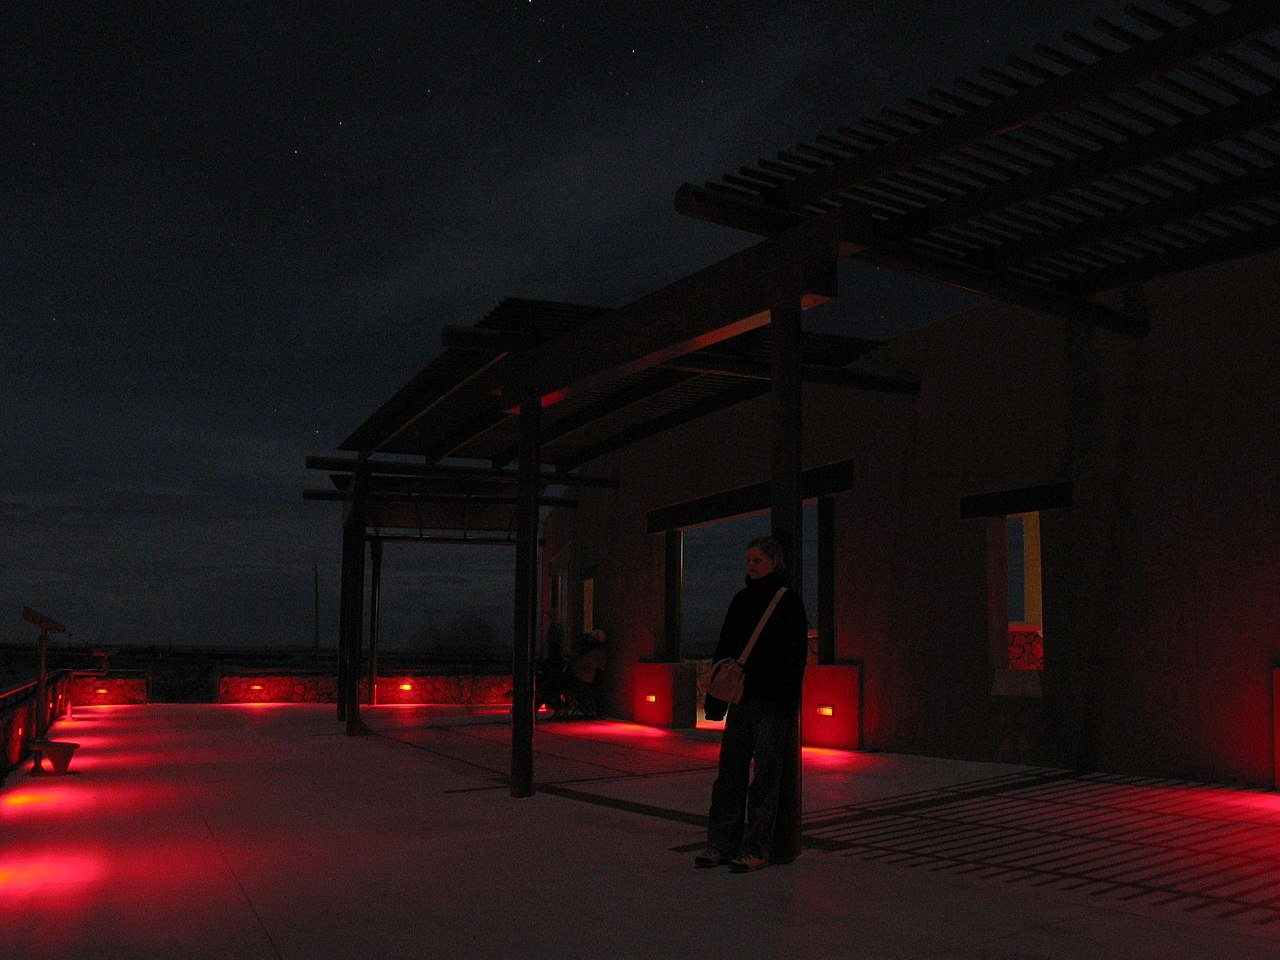 Marfa Lights Viewing Platform, Marfa, Texas (Photo Credit: Wikipedia)